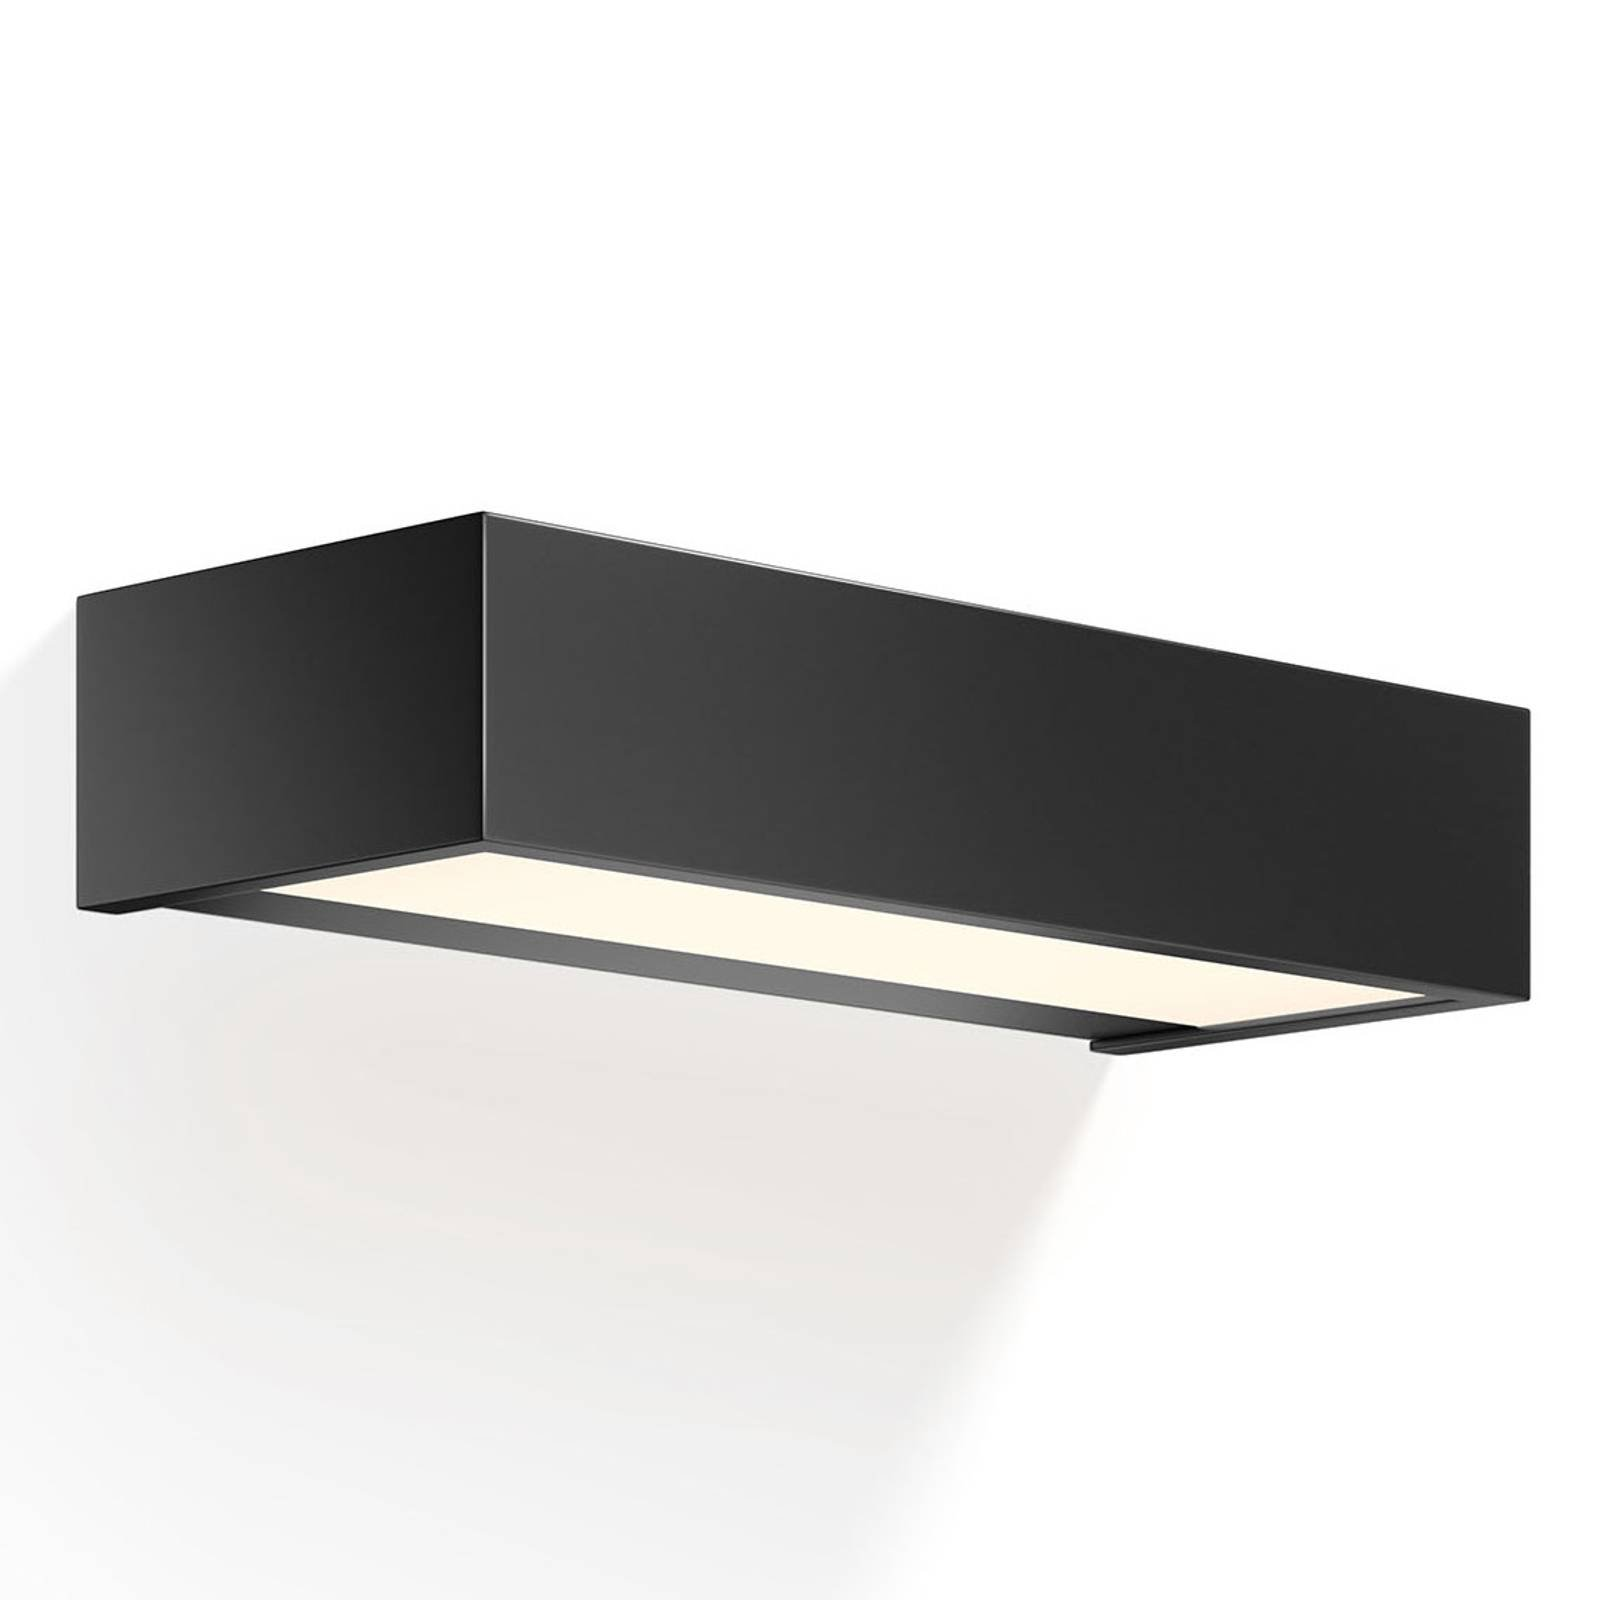 Decor Walther Box LED-lampe svart 2 700 K 25 cm